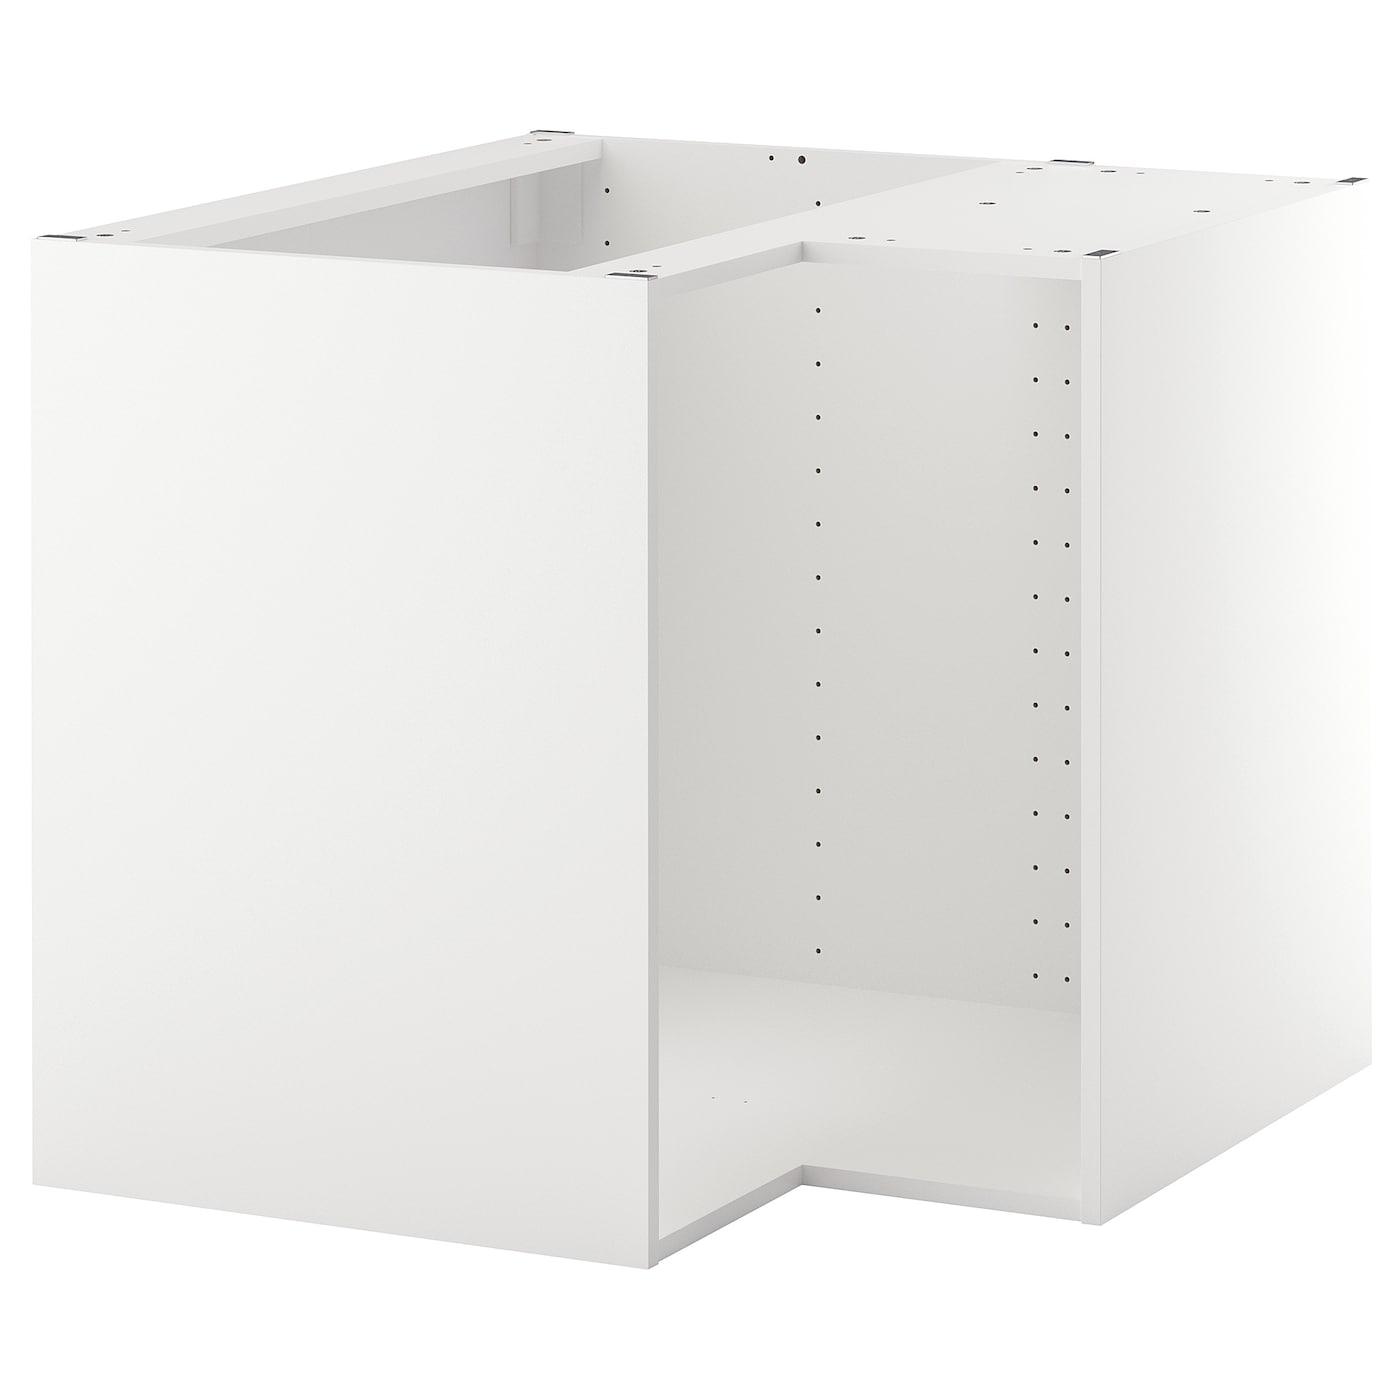 Altezza Cucina Ikea metod corner base cabinet frame - white 88x88x80 cm